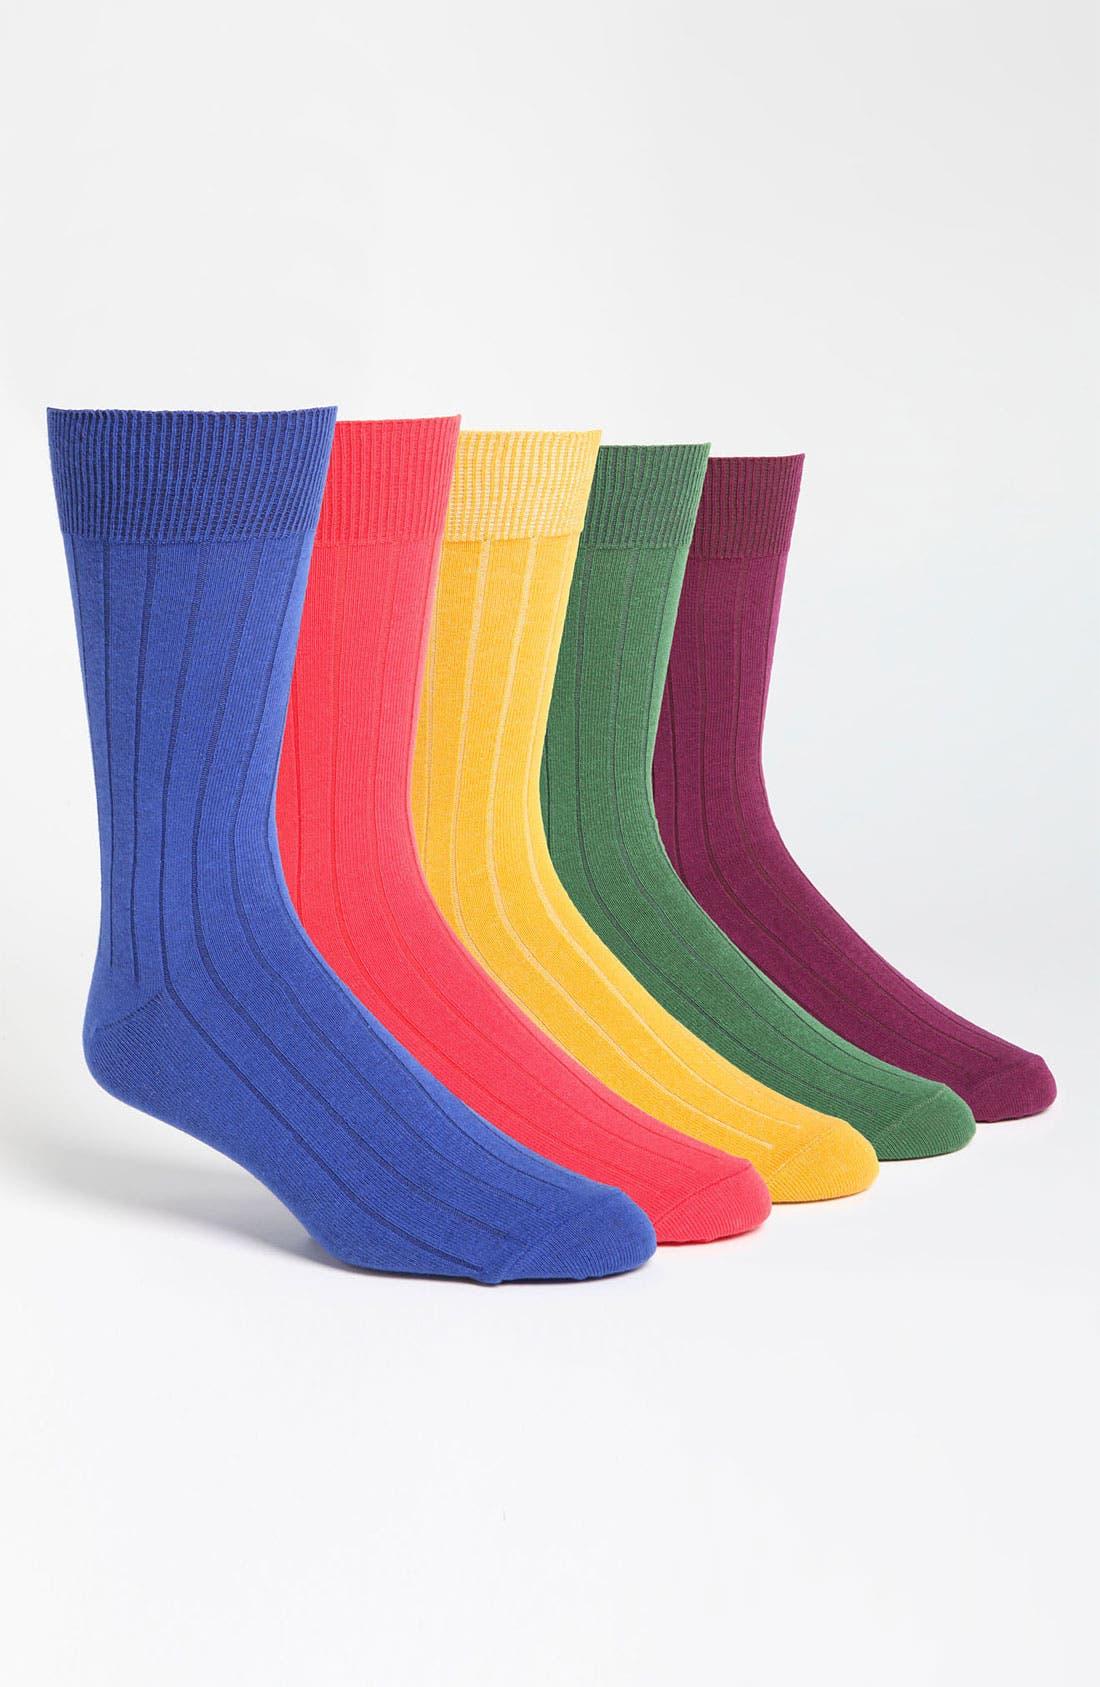 Alternate Image 1 Selected - Topman 'Navarro' Socks (Set of 5)